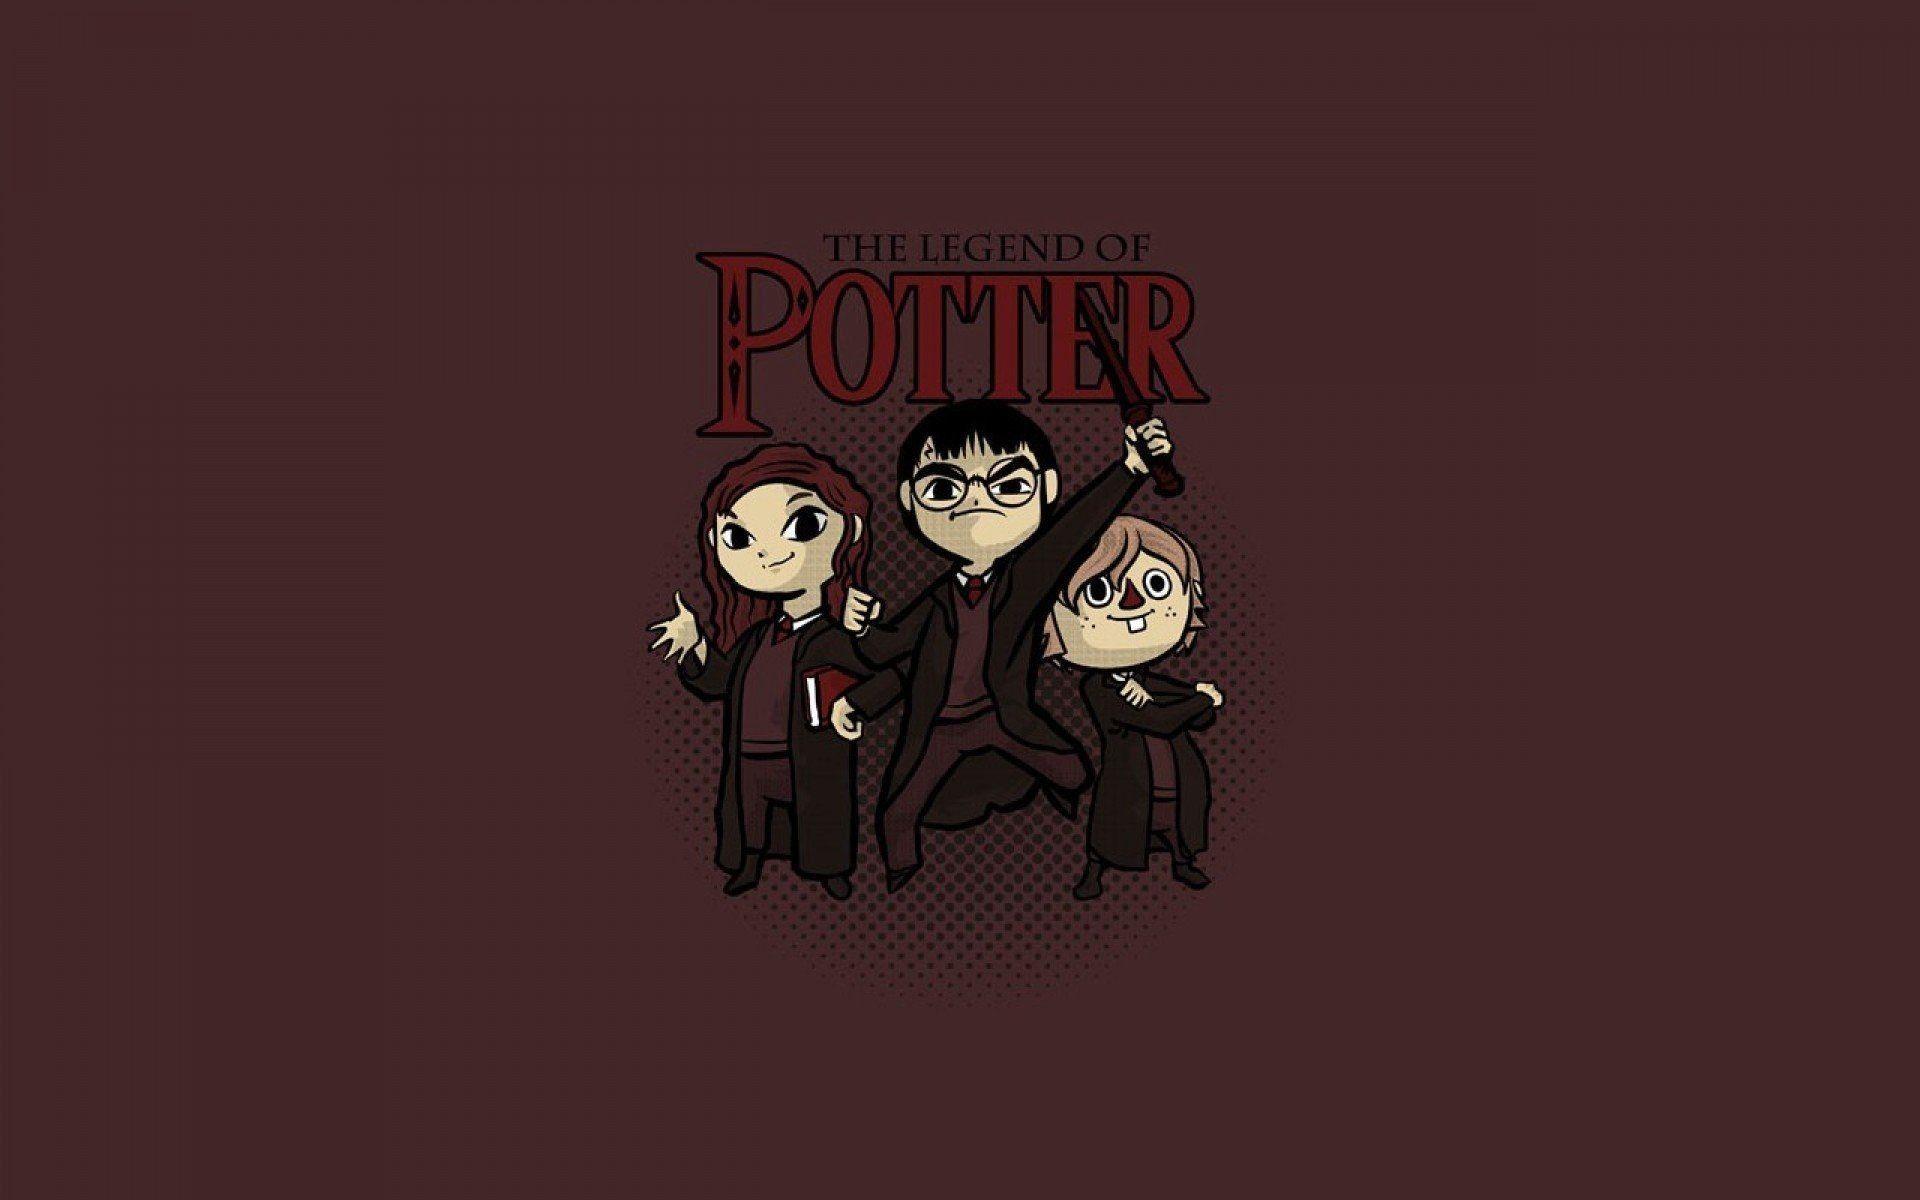 Harry Potter Wallpaper Harry Potter Wallpaper Harry Potter Crossover Rowling Harry Potter